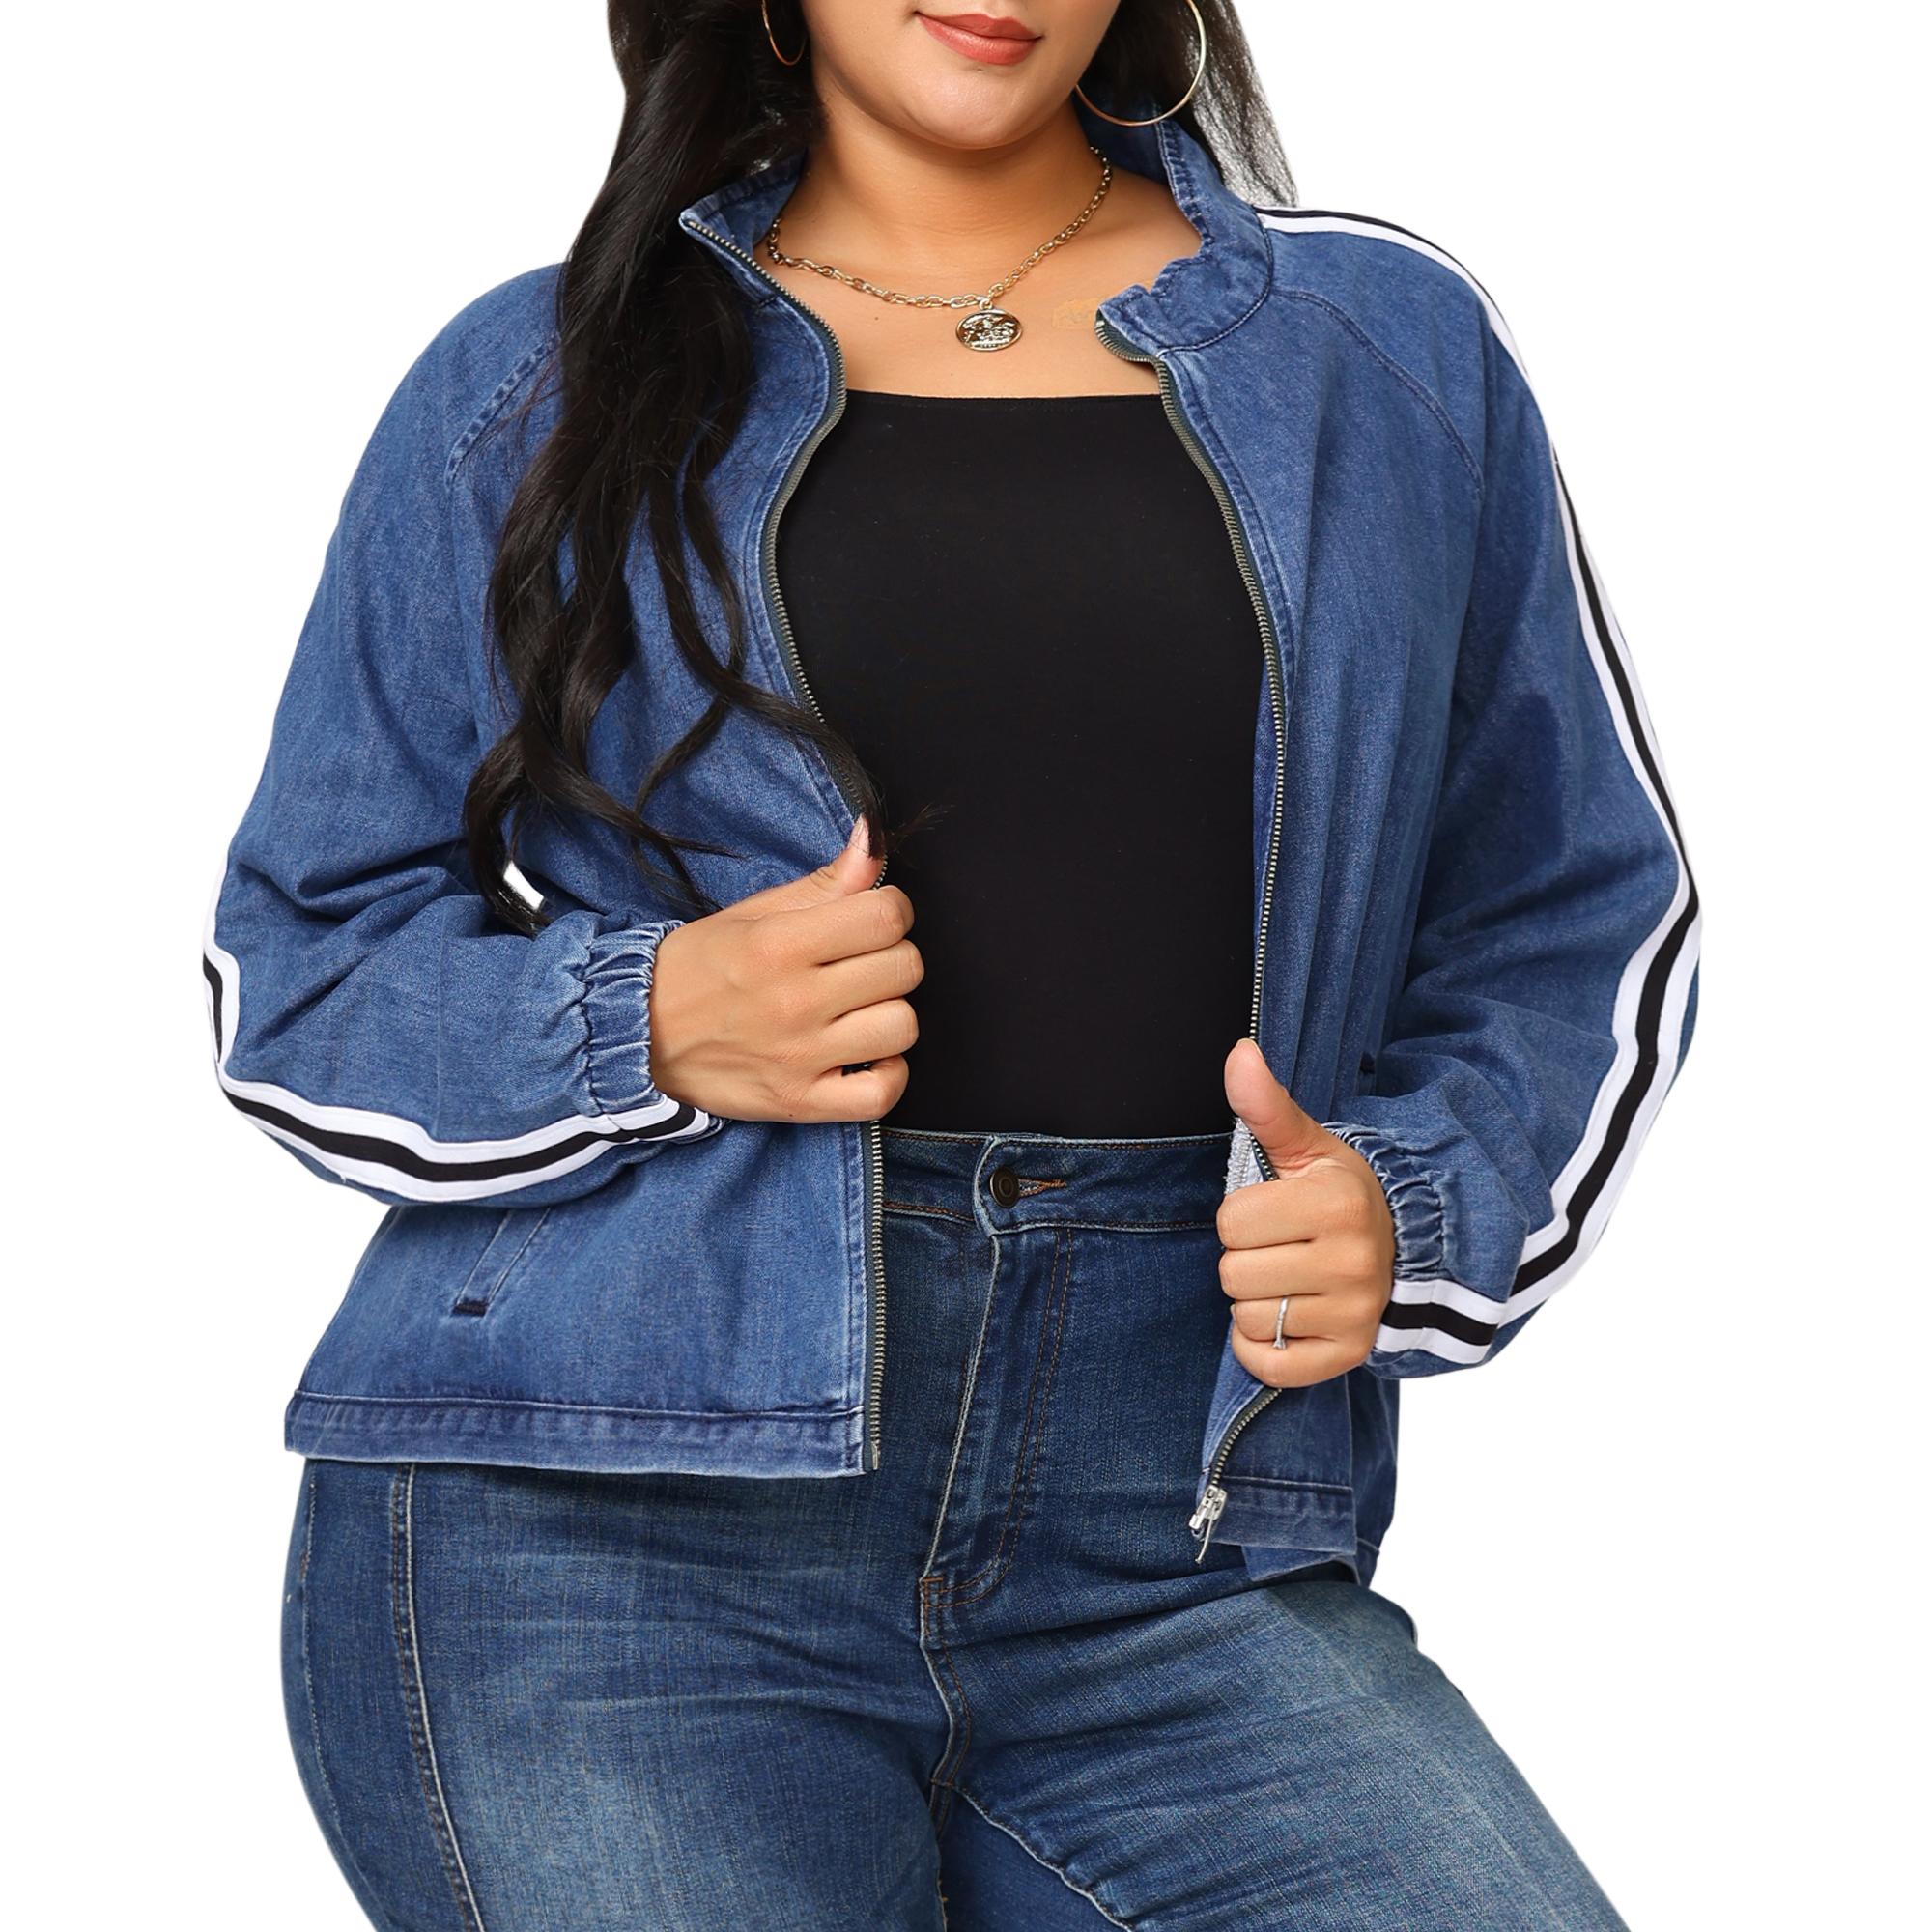 Women's Plus Size Jacket Contrast Color Stand Collar Denim Jackets Blue 2X